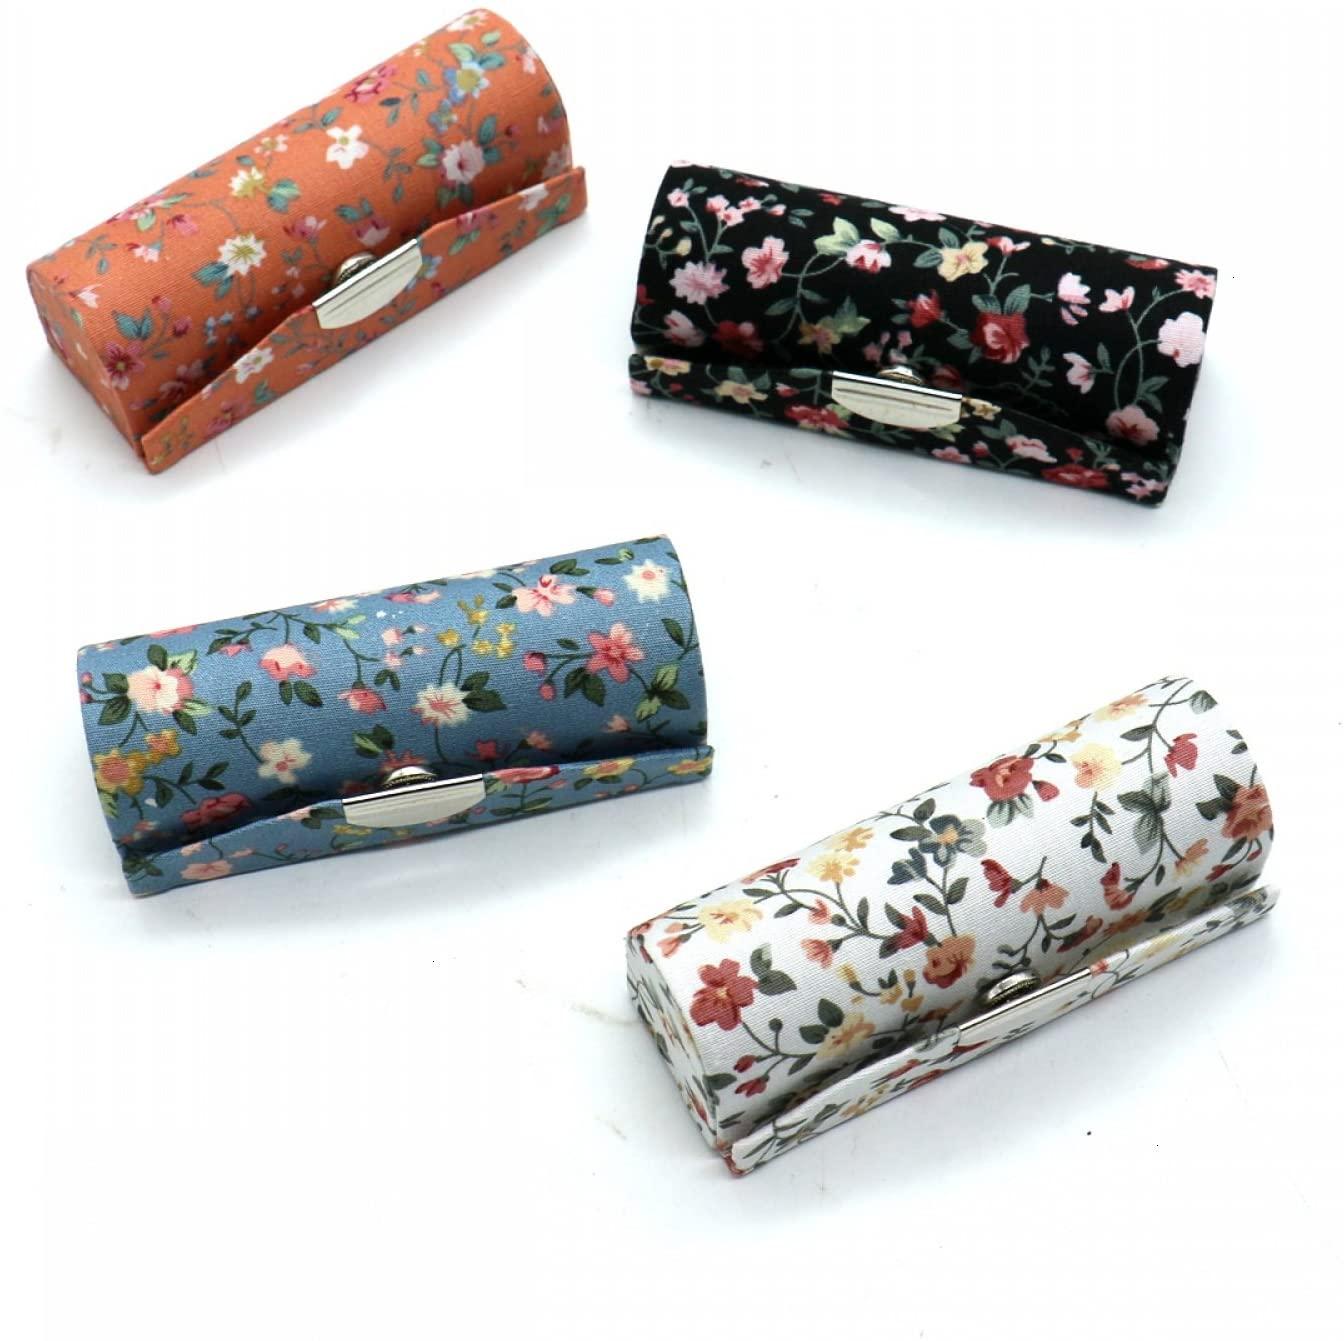 SenseYo 4 Pcs Ladies Floral Lipstick Case Holder with Mirror, Cosmetic Storage Kit Makeup Travel Cases Organizer Bag for Purse